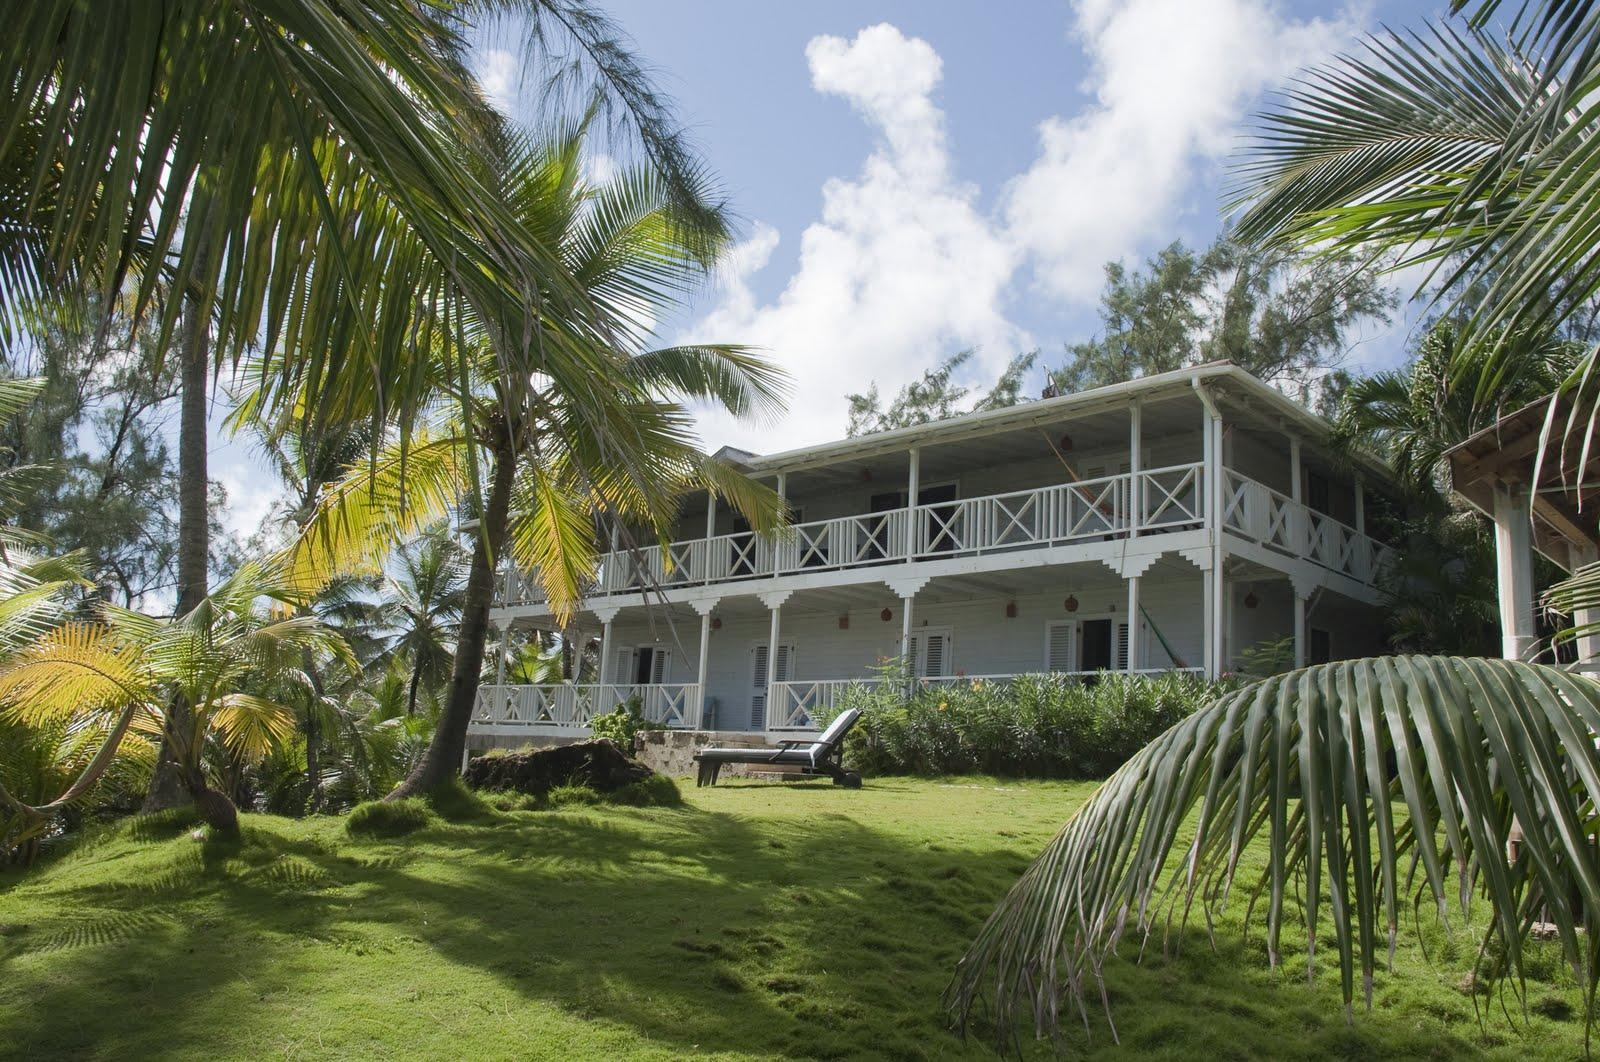 Sea U Guest House Caribbean Stay